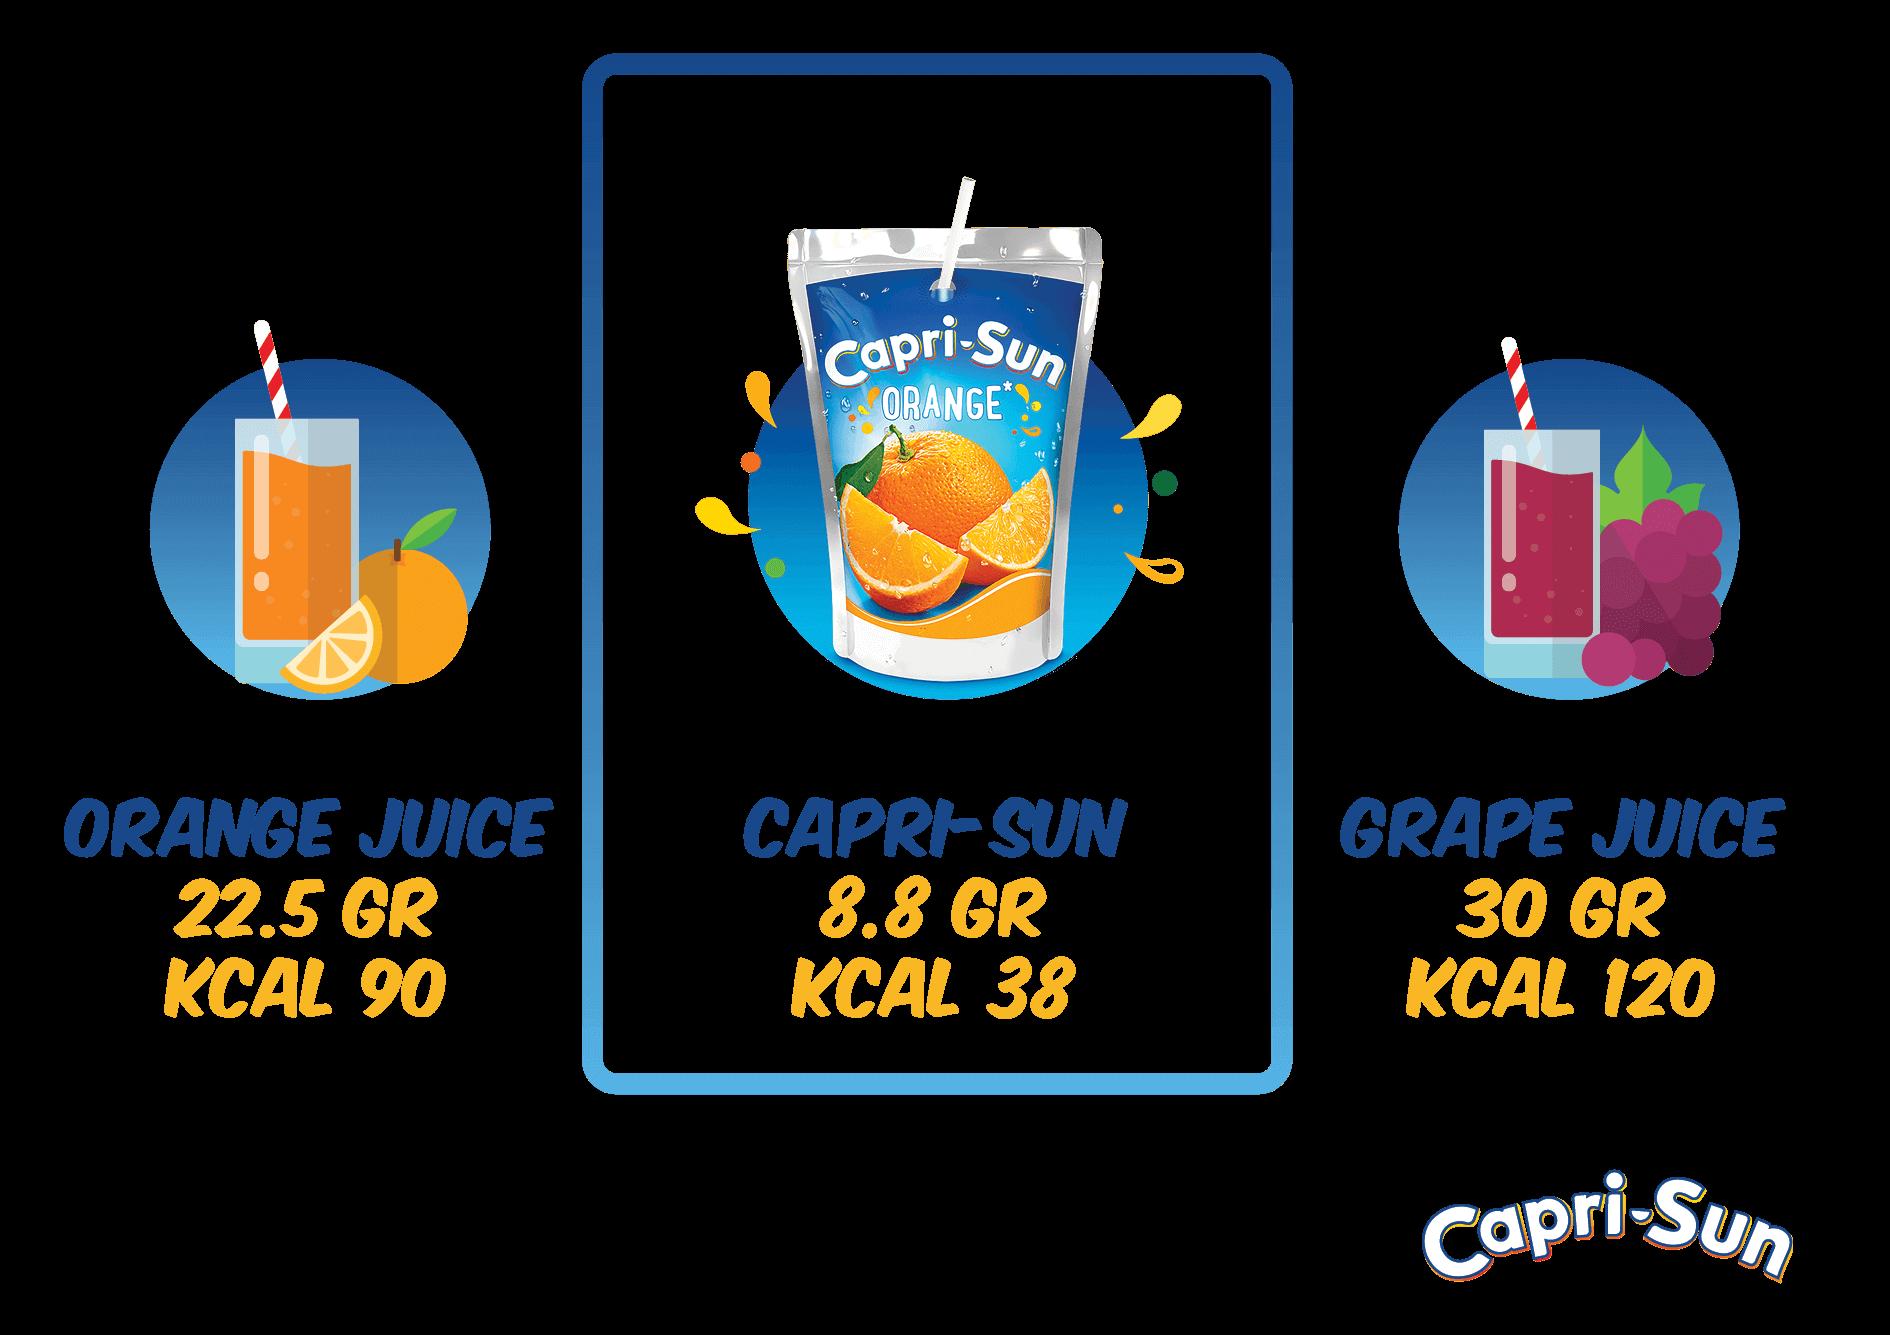 Comparison of sugar content in Capri-Sun, orange juice and grape juice.